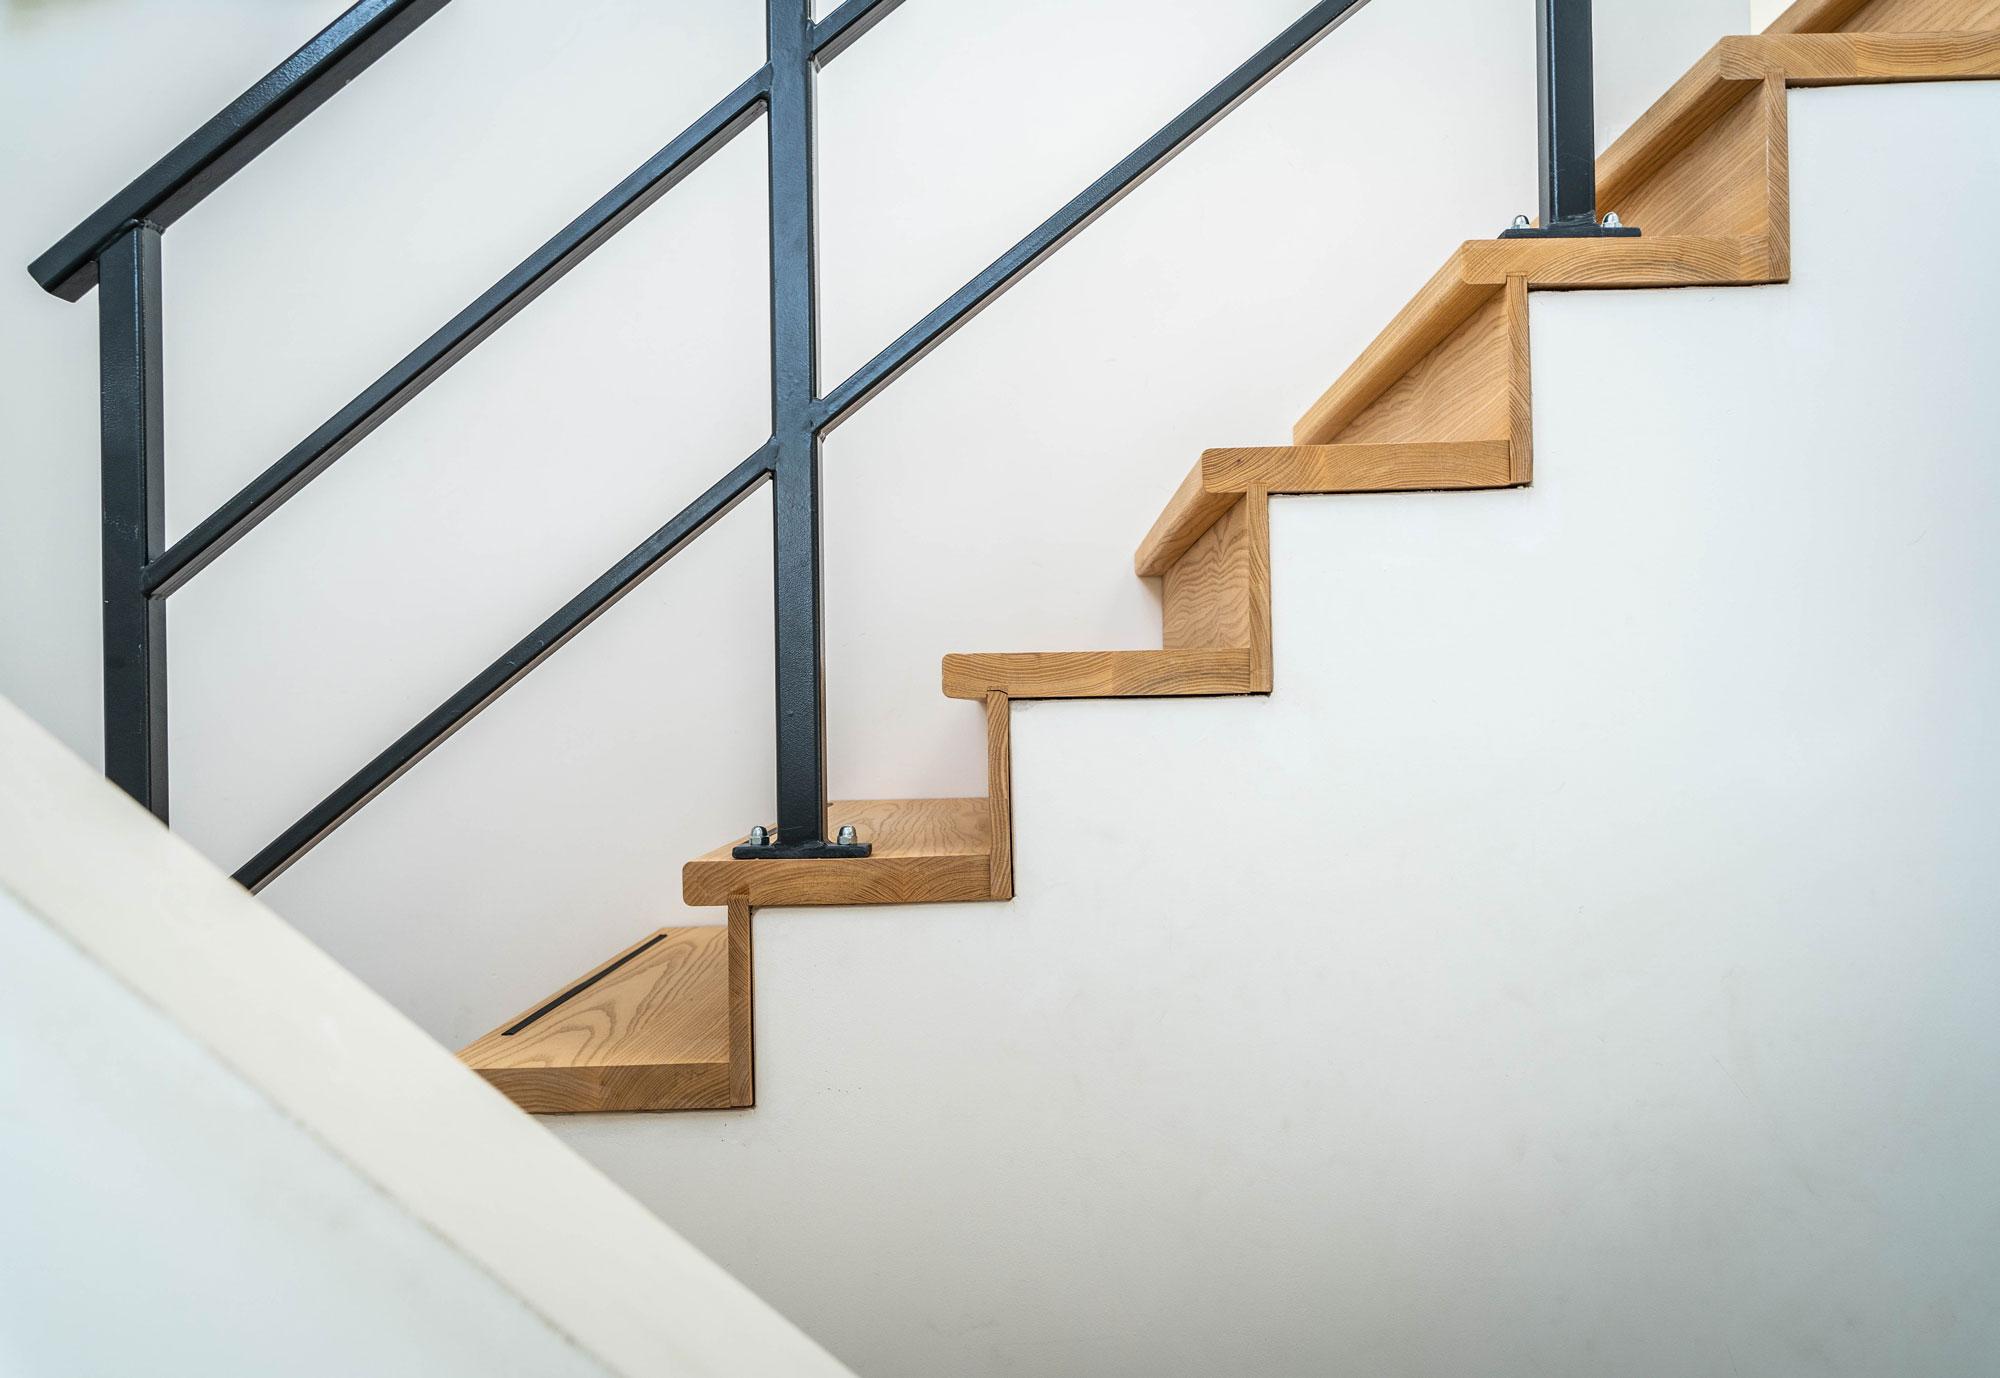 een trap hoger dijkstra moderne ontwerpen trap